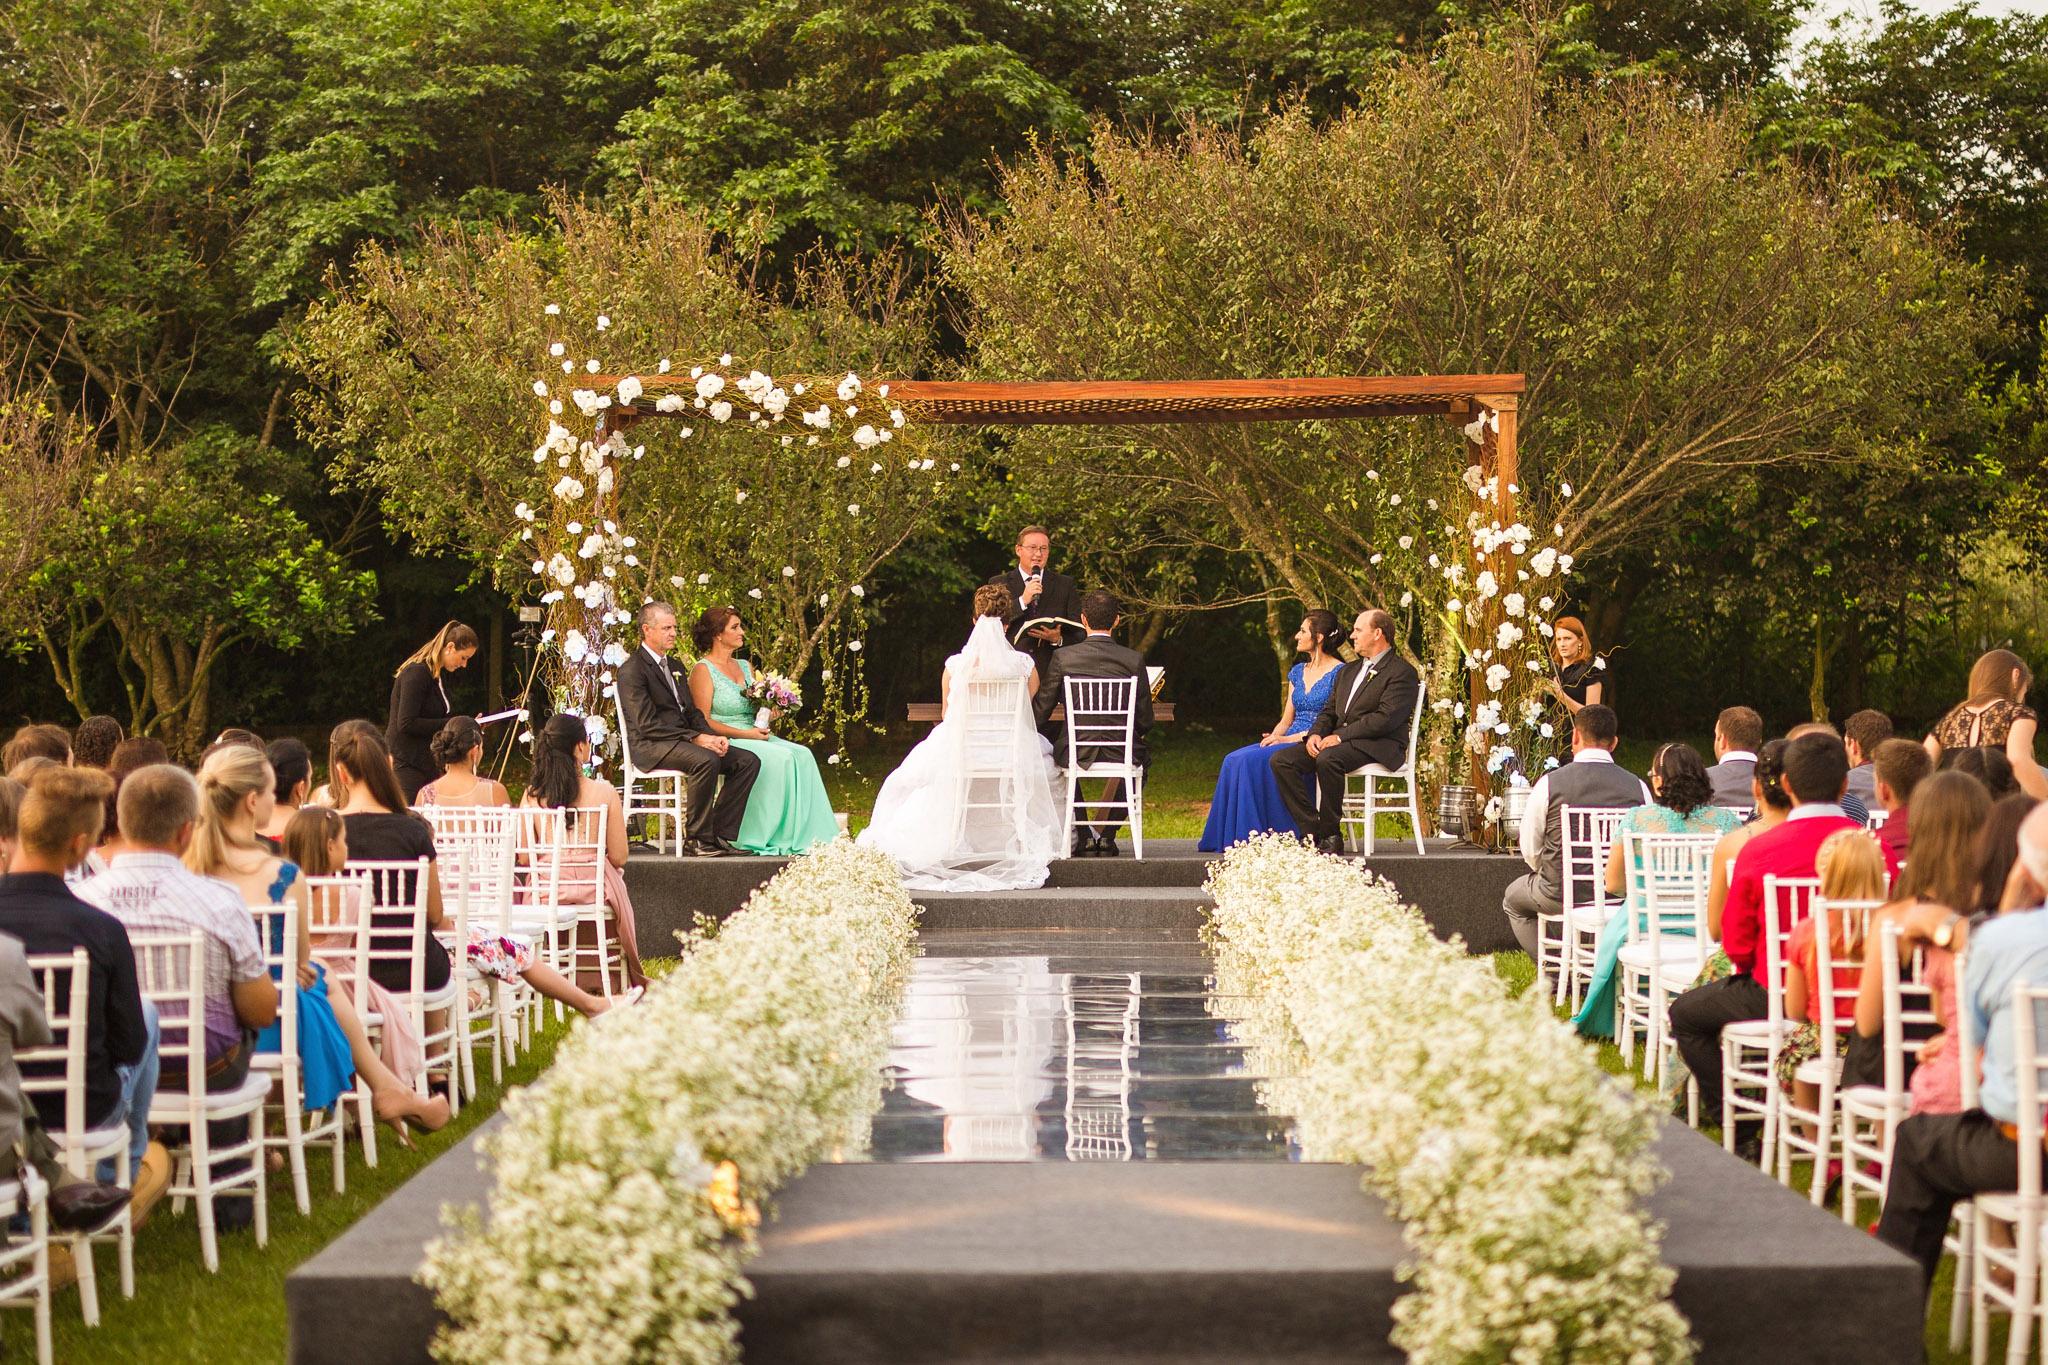 wedding-travellers-destination-wedding-photography-brazil-iguazu-7